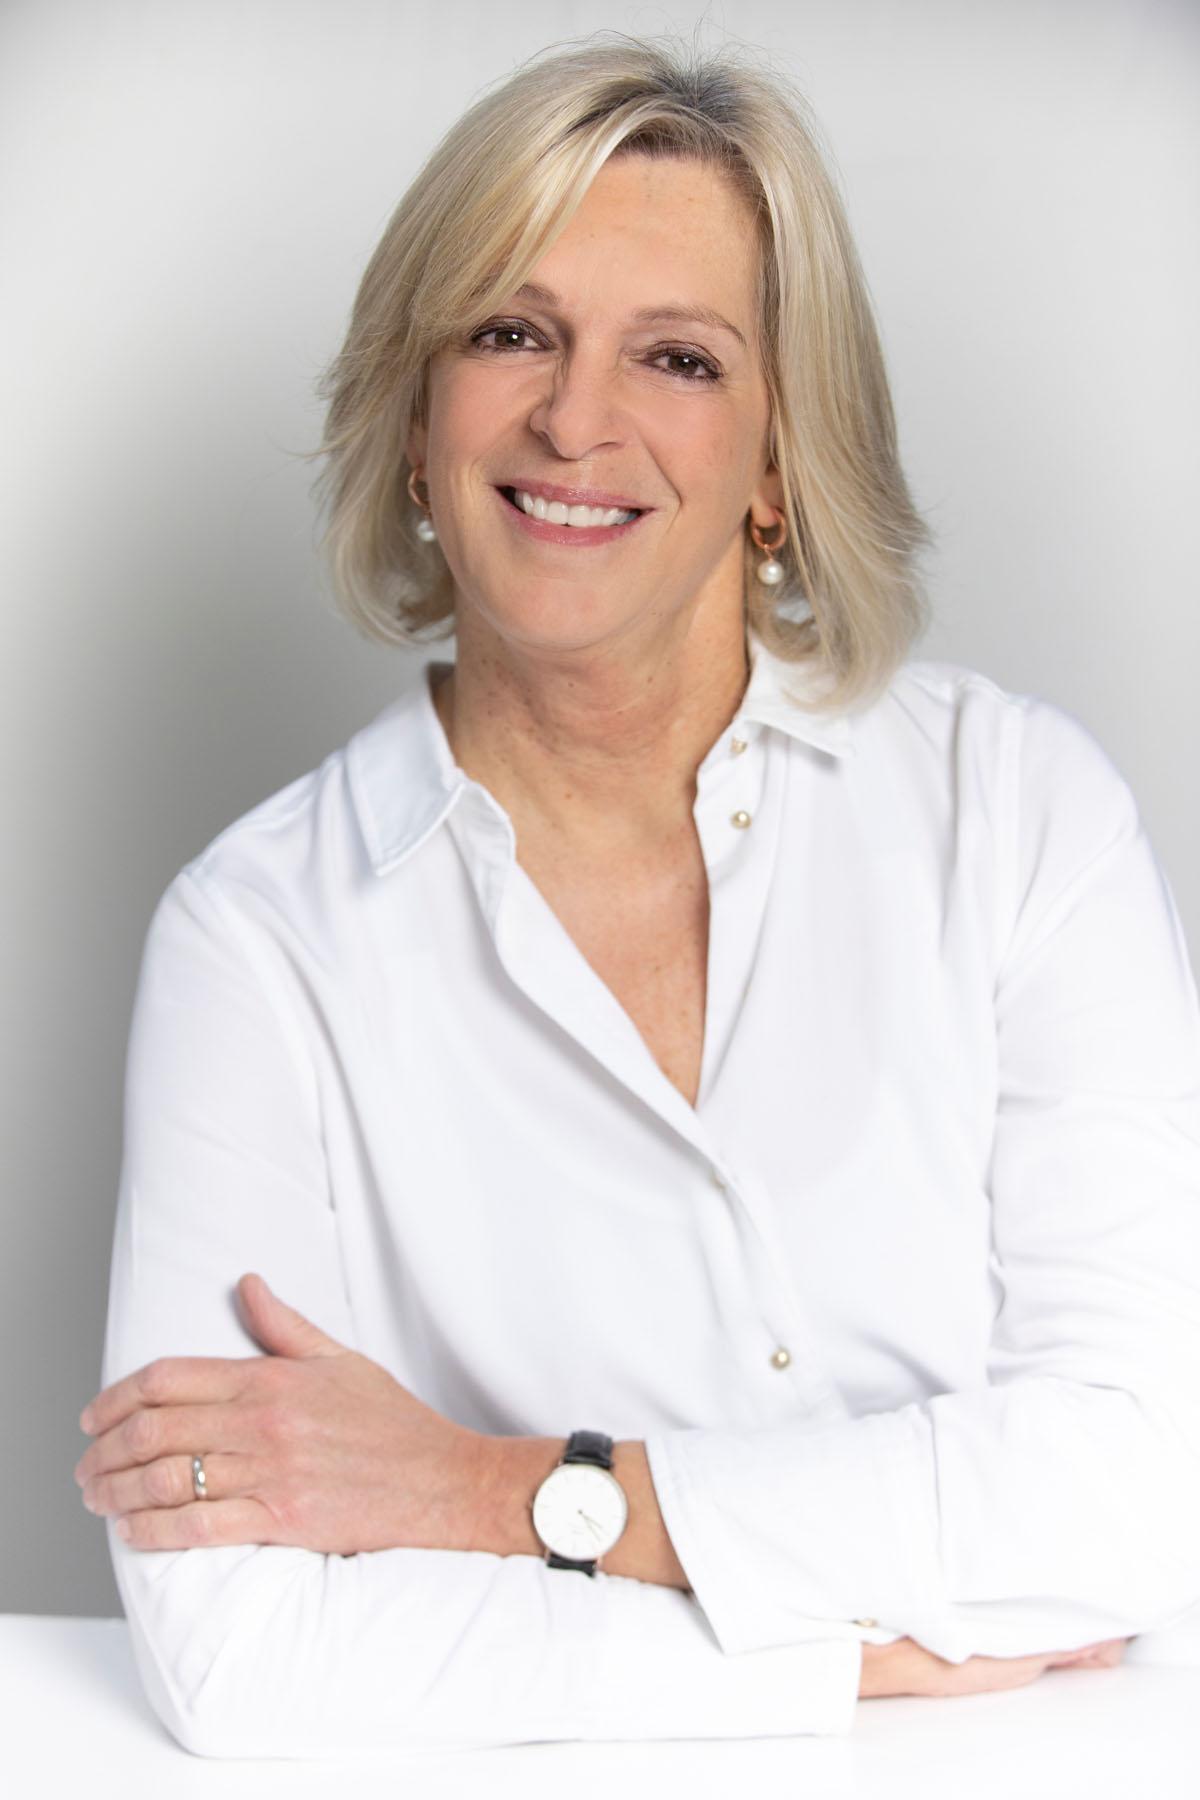 Nicolette Cosmeticclinics